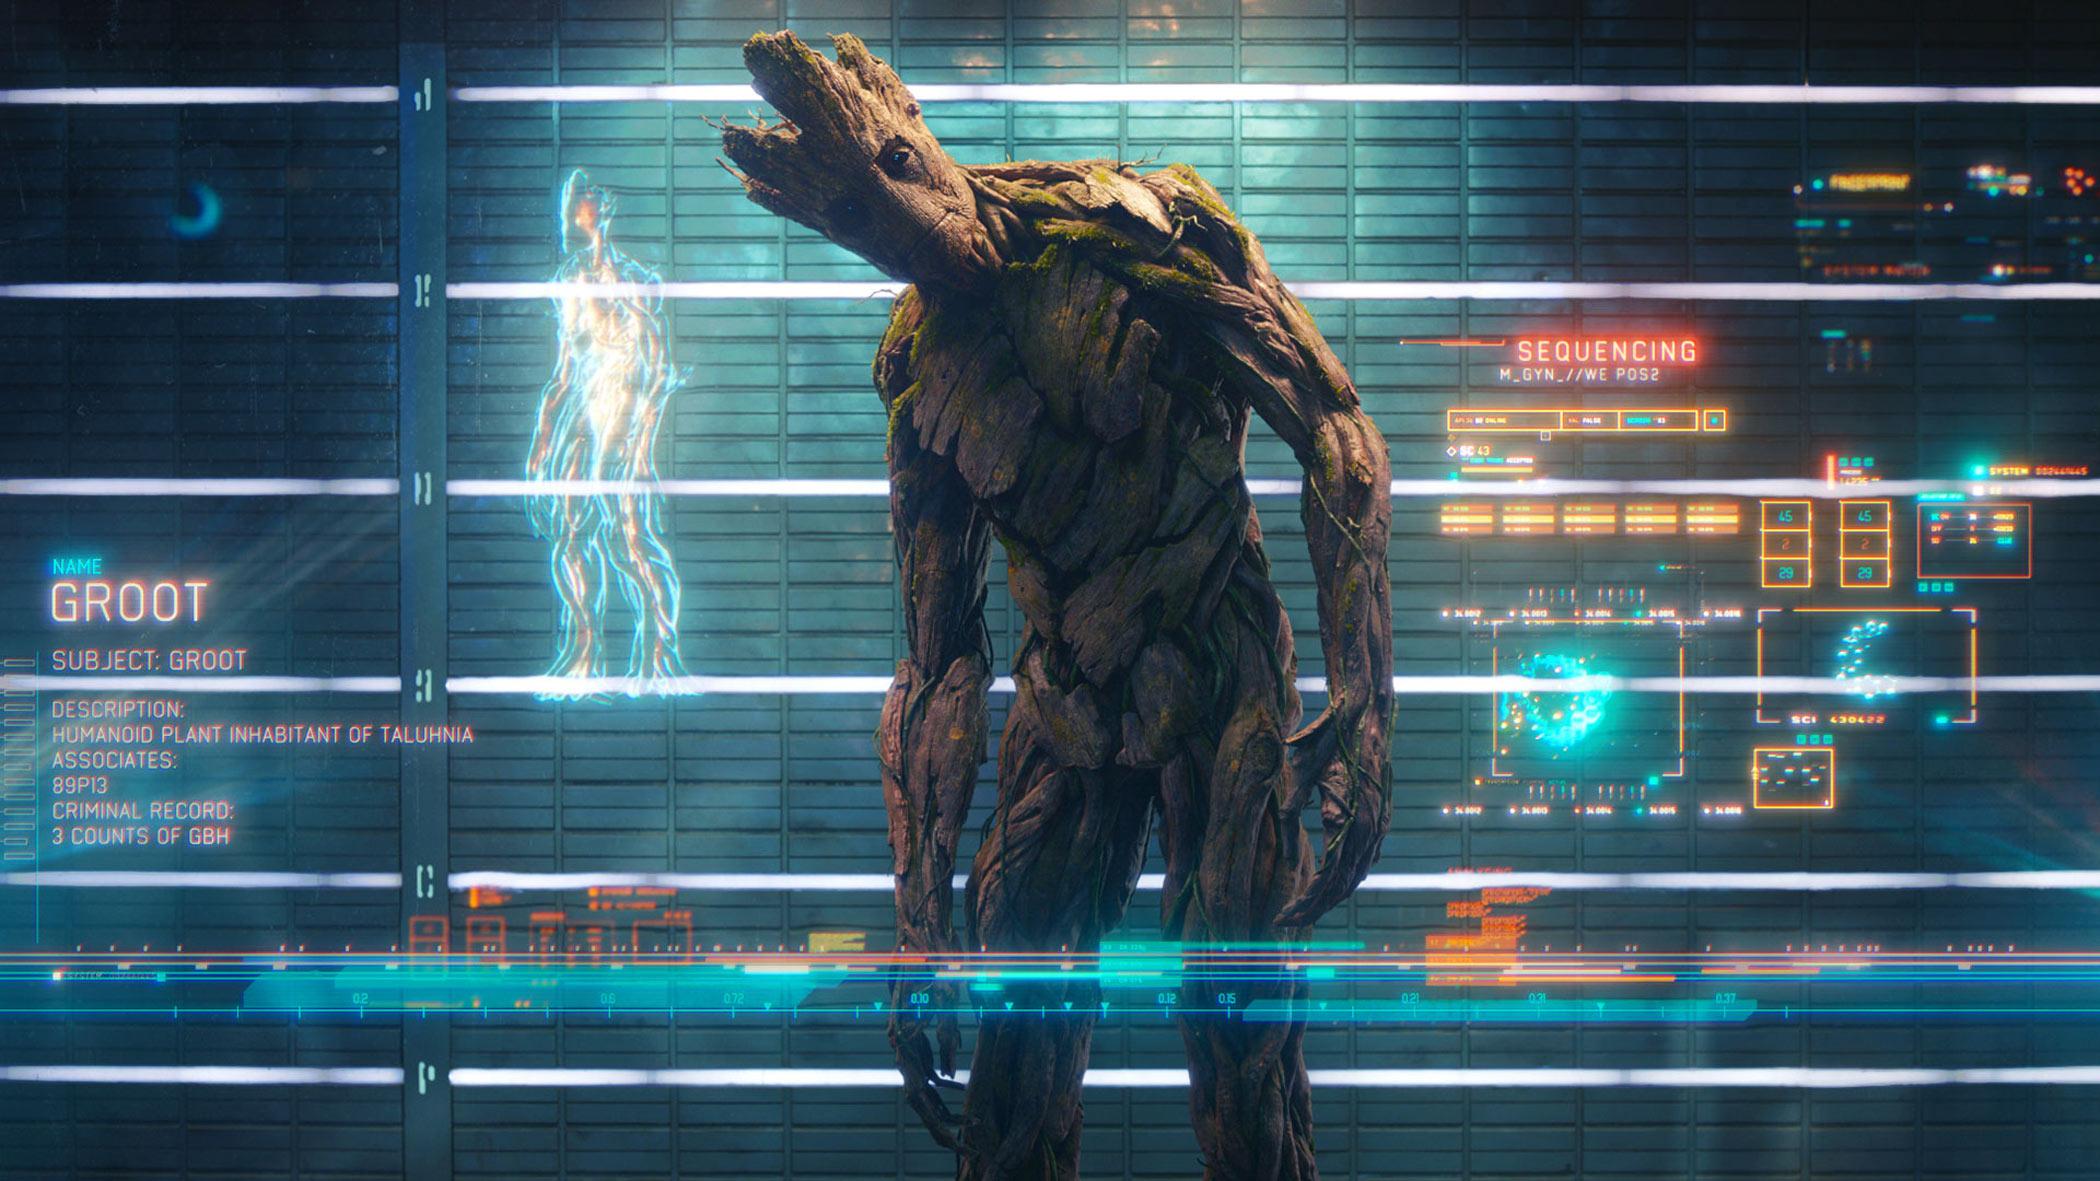 Planos De Fundo Hd Para Pc: Papel De Parede Groot: Guardiões Da Galaxia Wallpaper Para